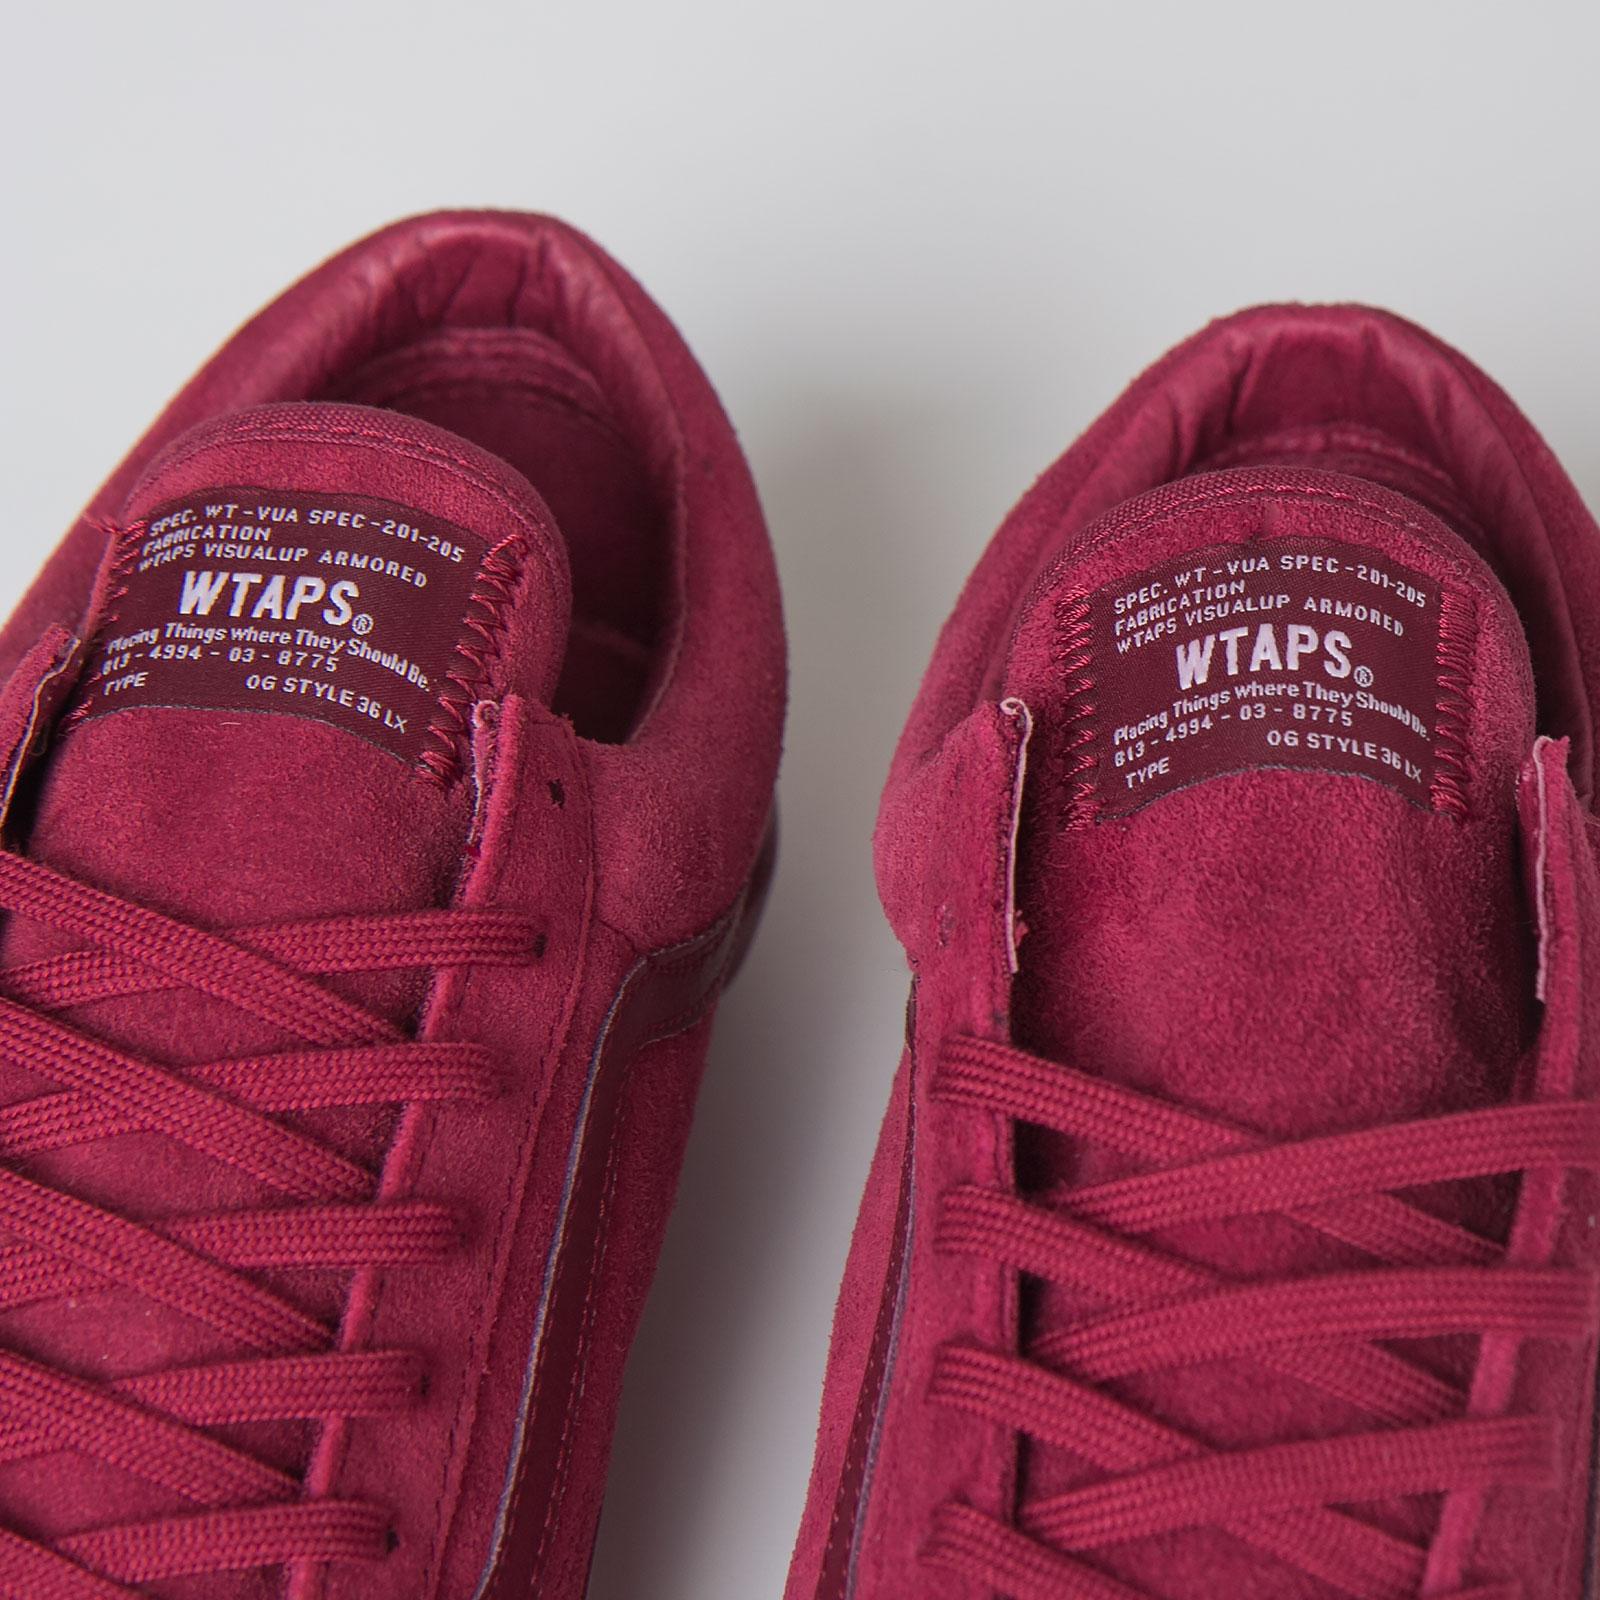 16a78510b2 Vans OG Style 36 LX (Wtaps) - Vsf5h1x - Sneakersnstuff